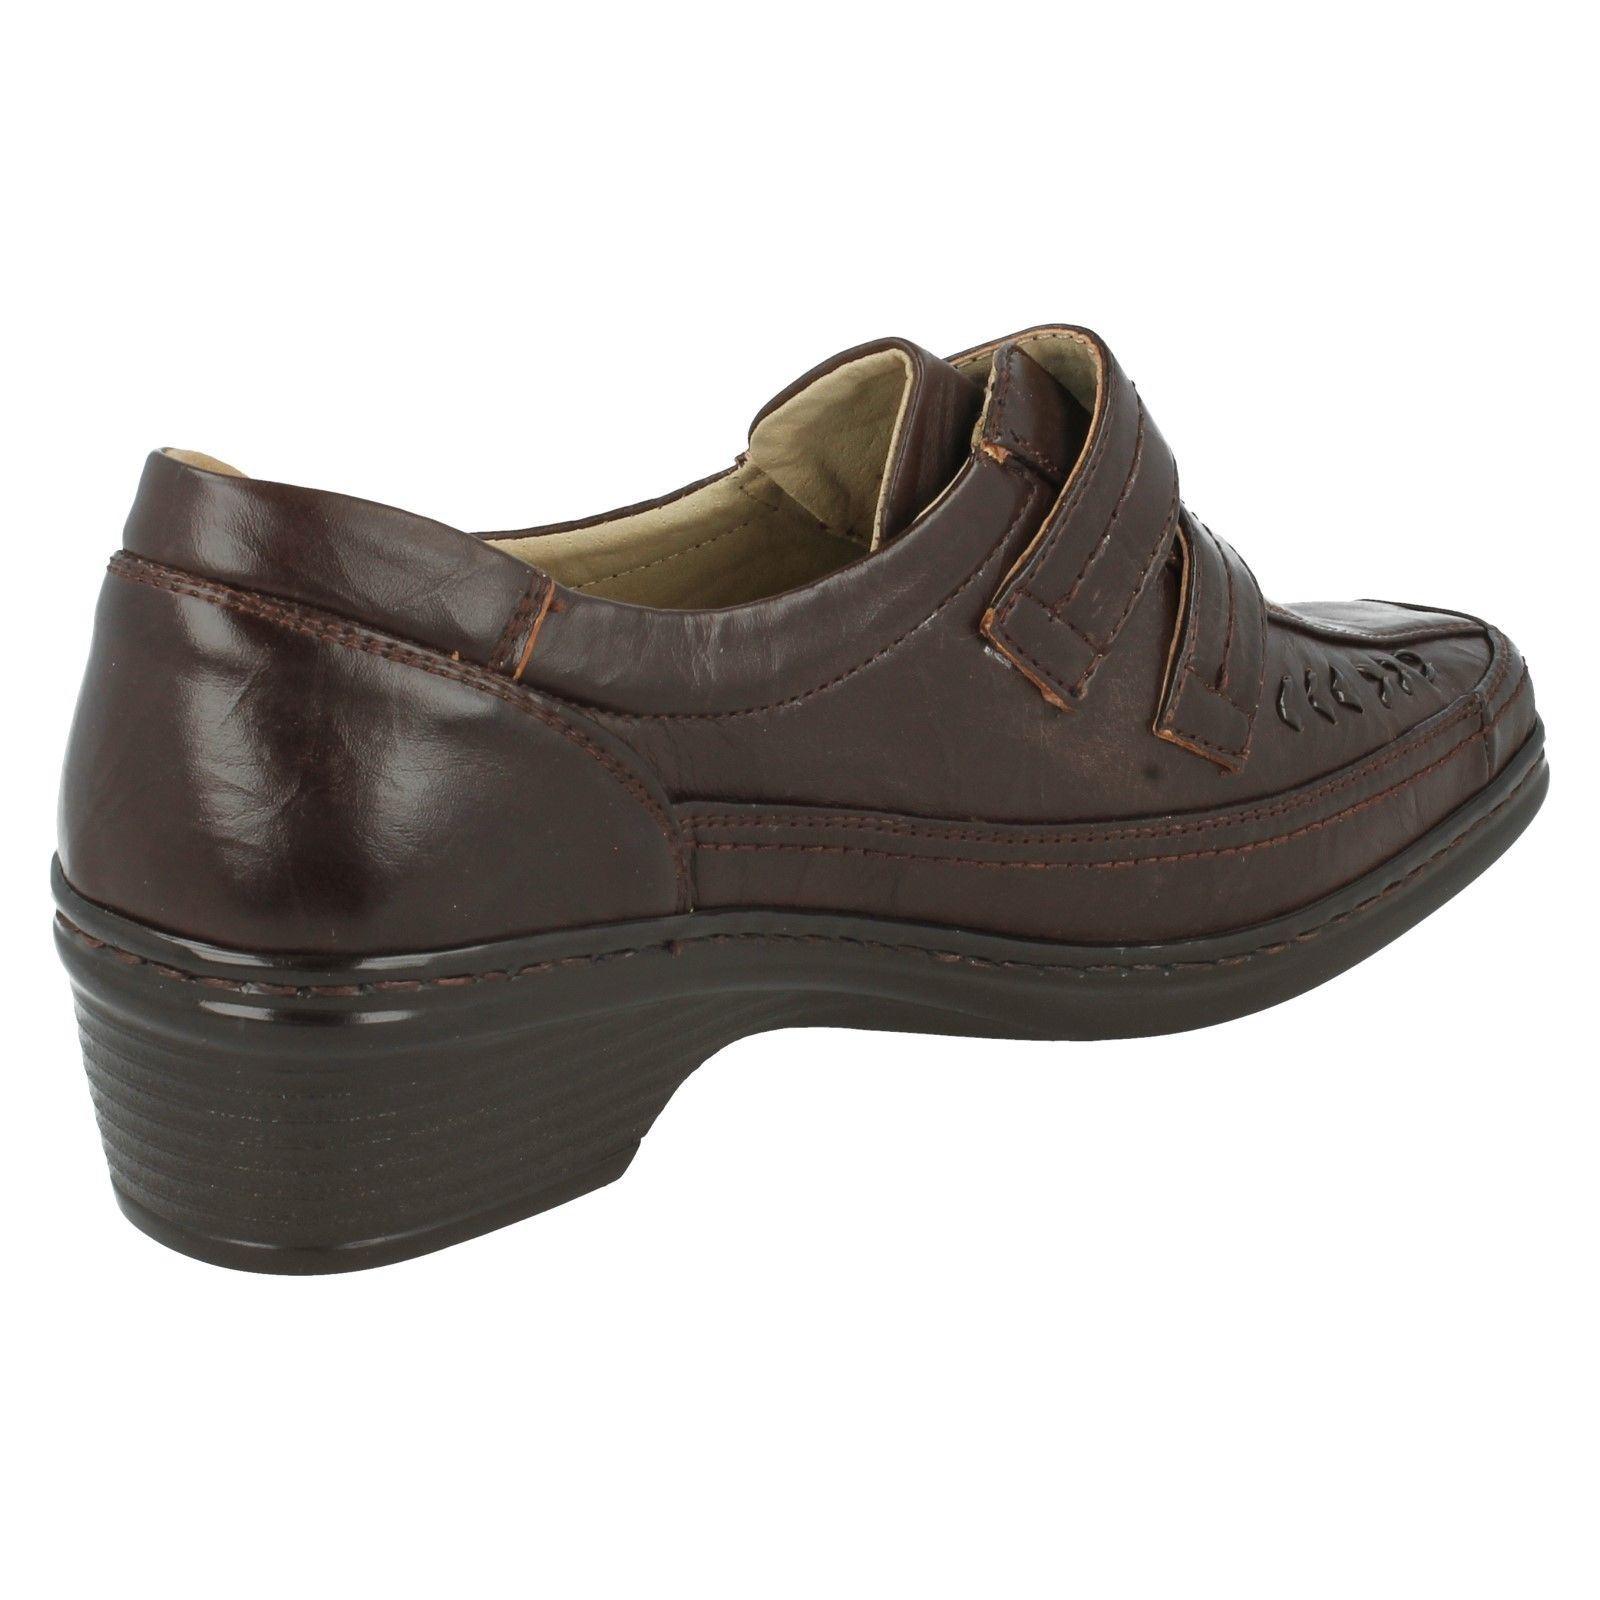 Señoras Eaze Cuña Baja Informal Zapatos sintético * F 3051 *